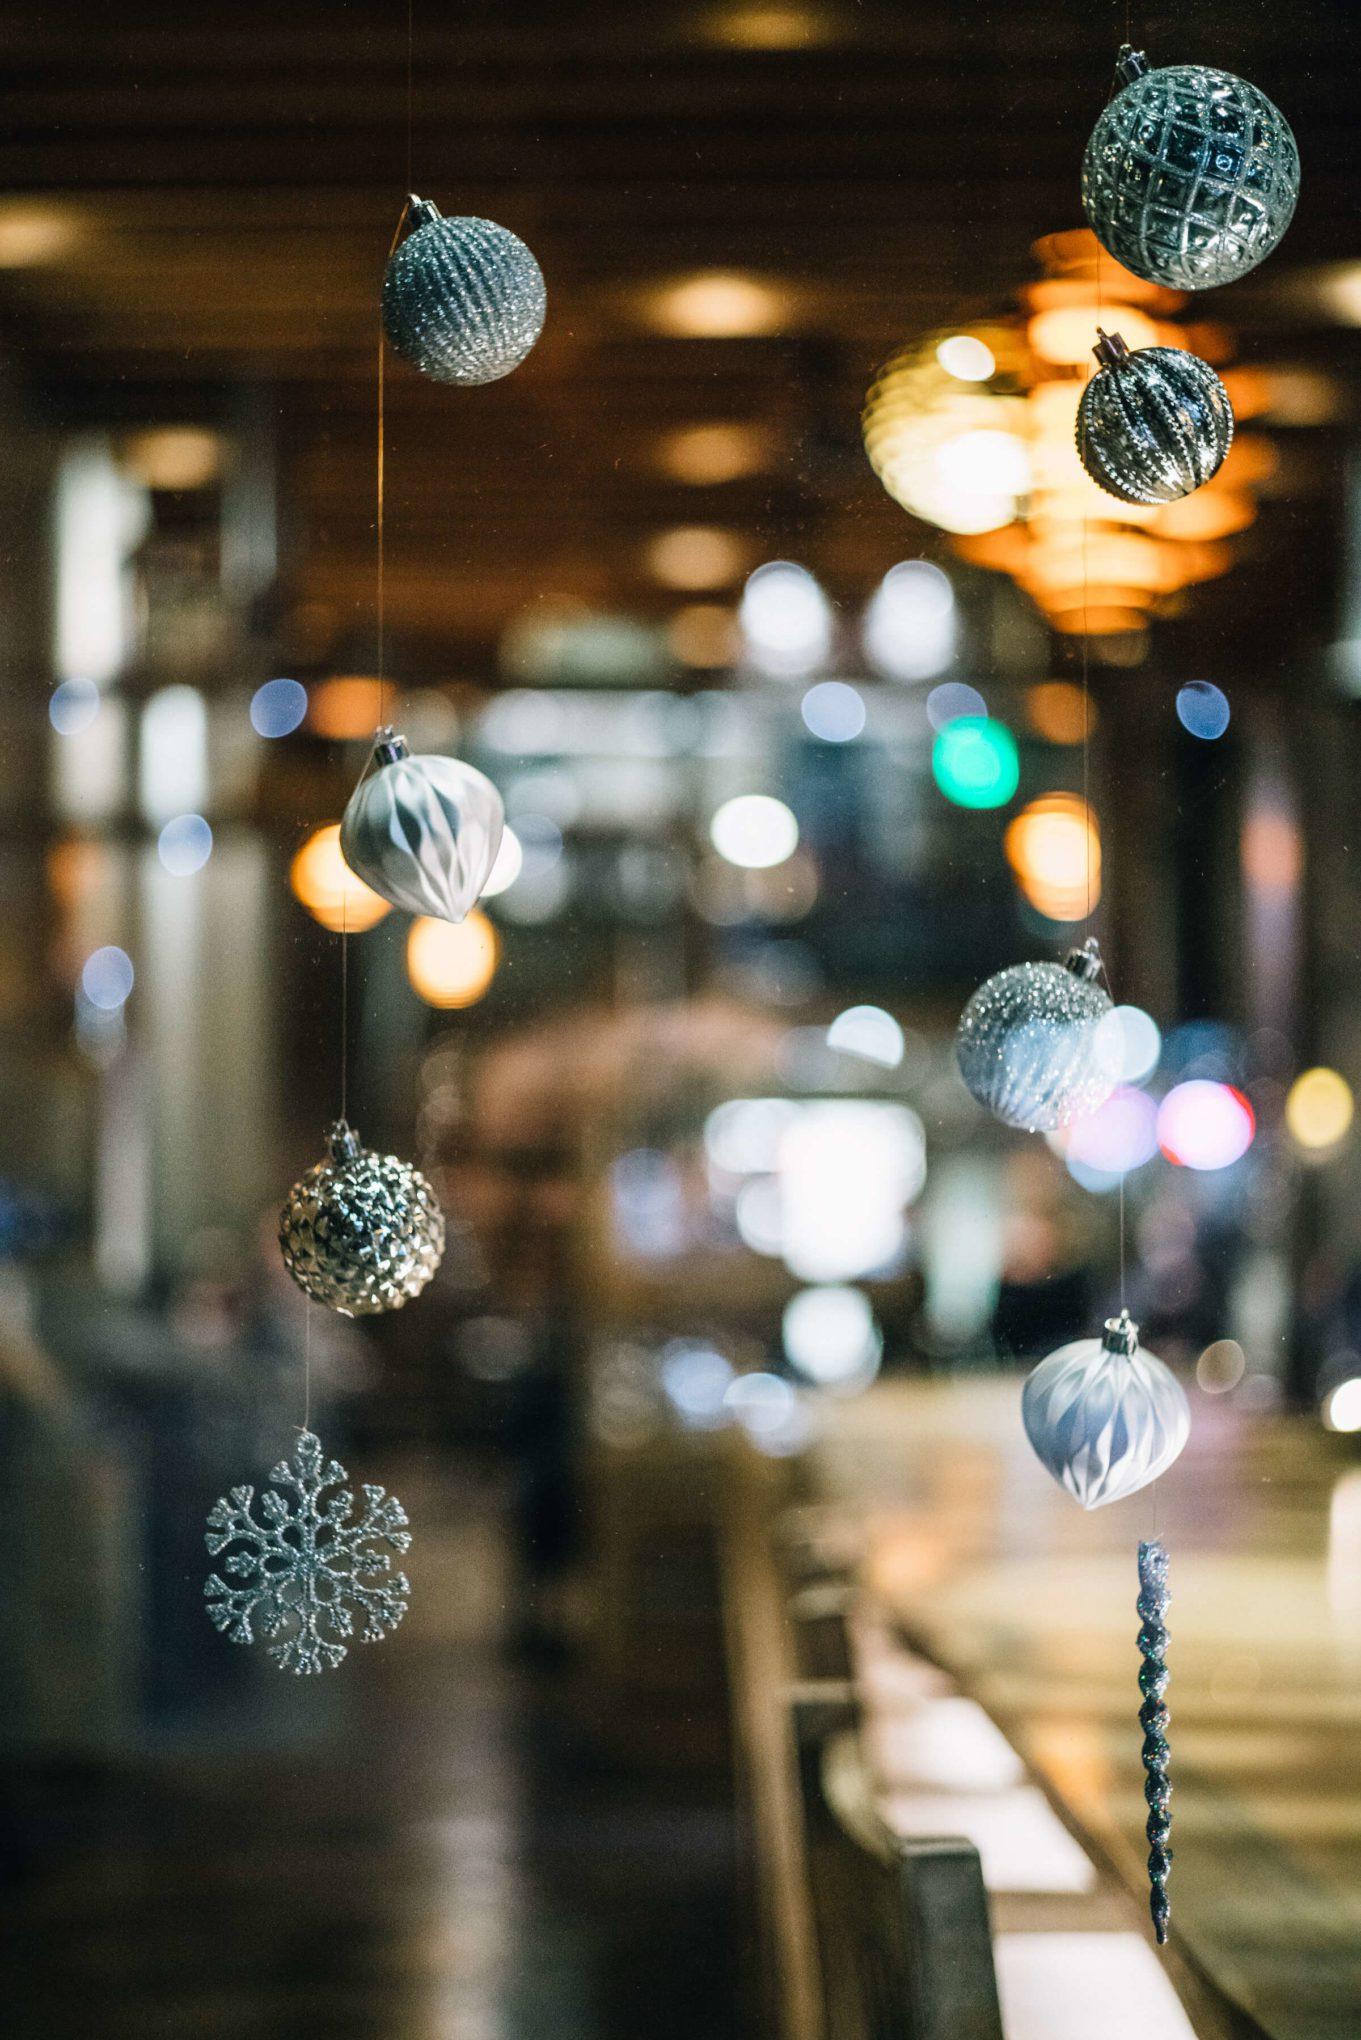 Christmas Decor at Restaurant Trokay in Truckee, Tahoe, California with The Taste Edit